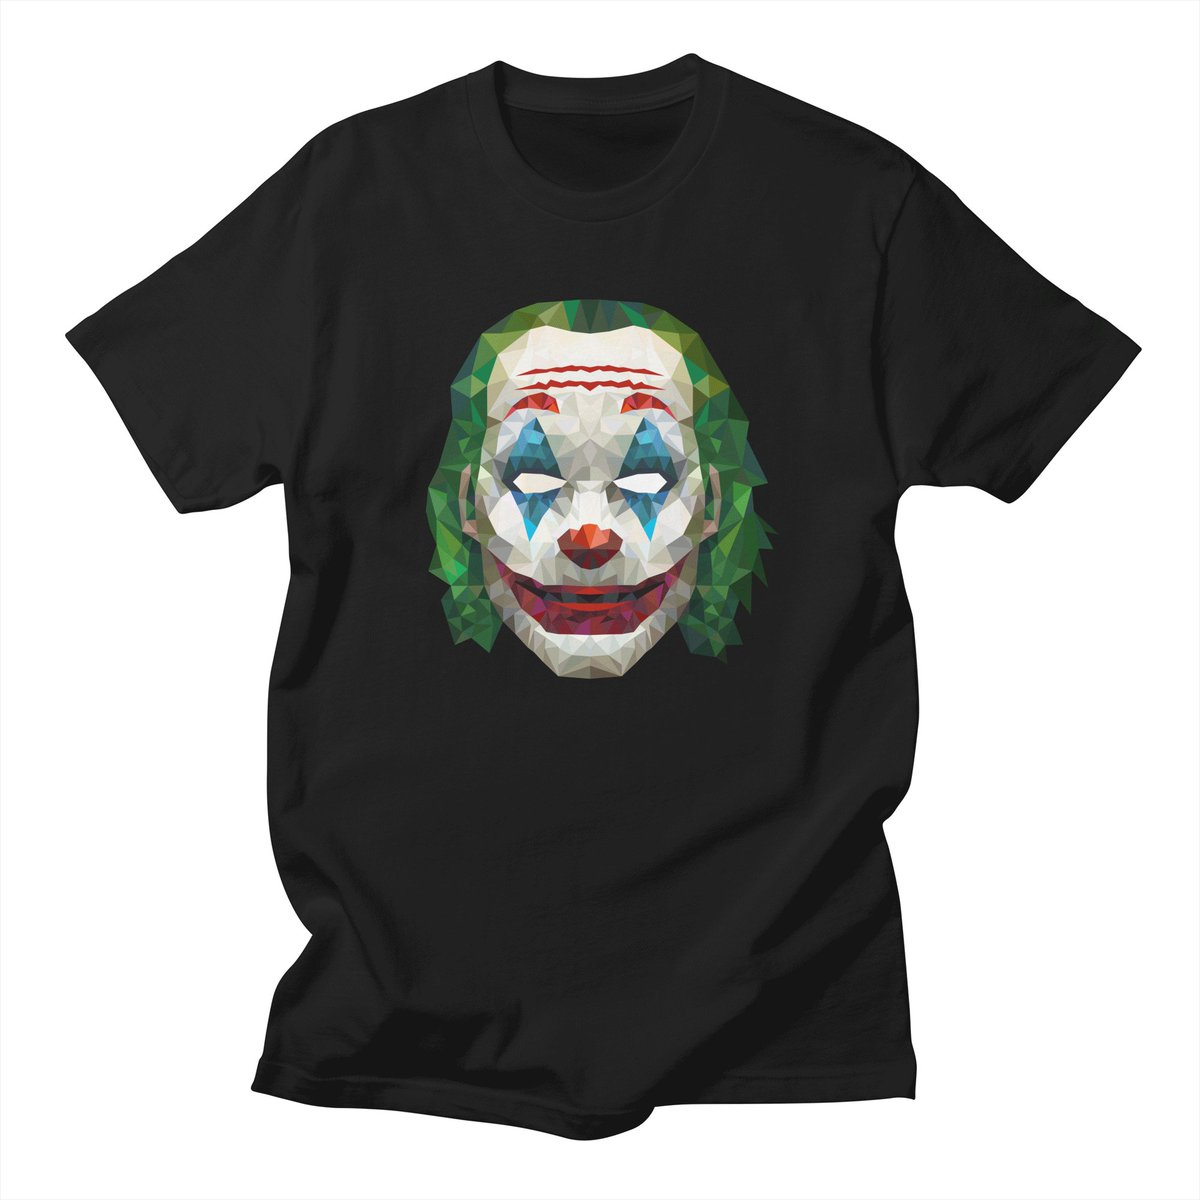 Check out my Joker design in all these killer colours  #threadless #illustration #design #tshirts #tshirts #tees #humor #batman #artistshops #geek #teeshirts #joker #comics #fashion #movies #scary #fantasy #fashion #geek #comics